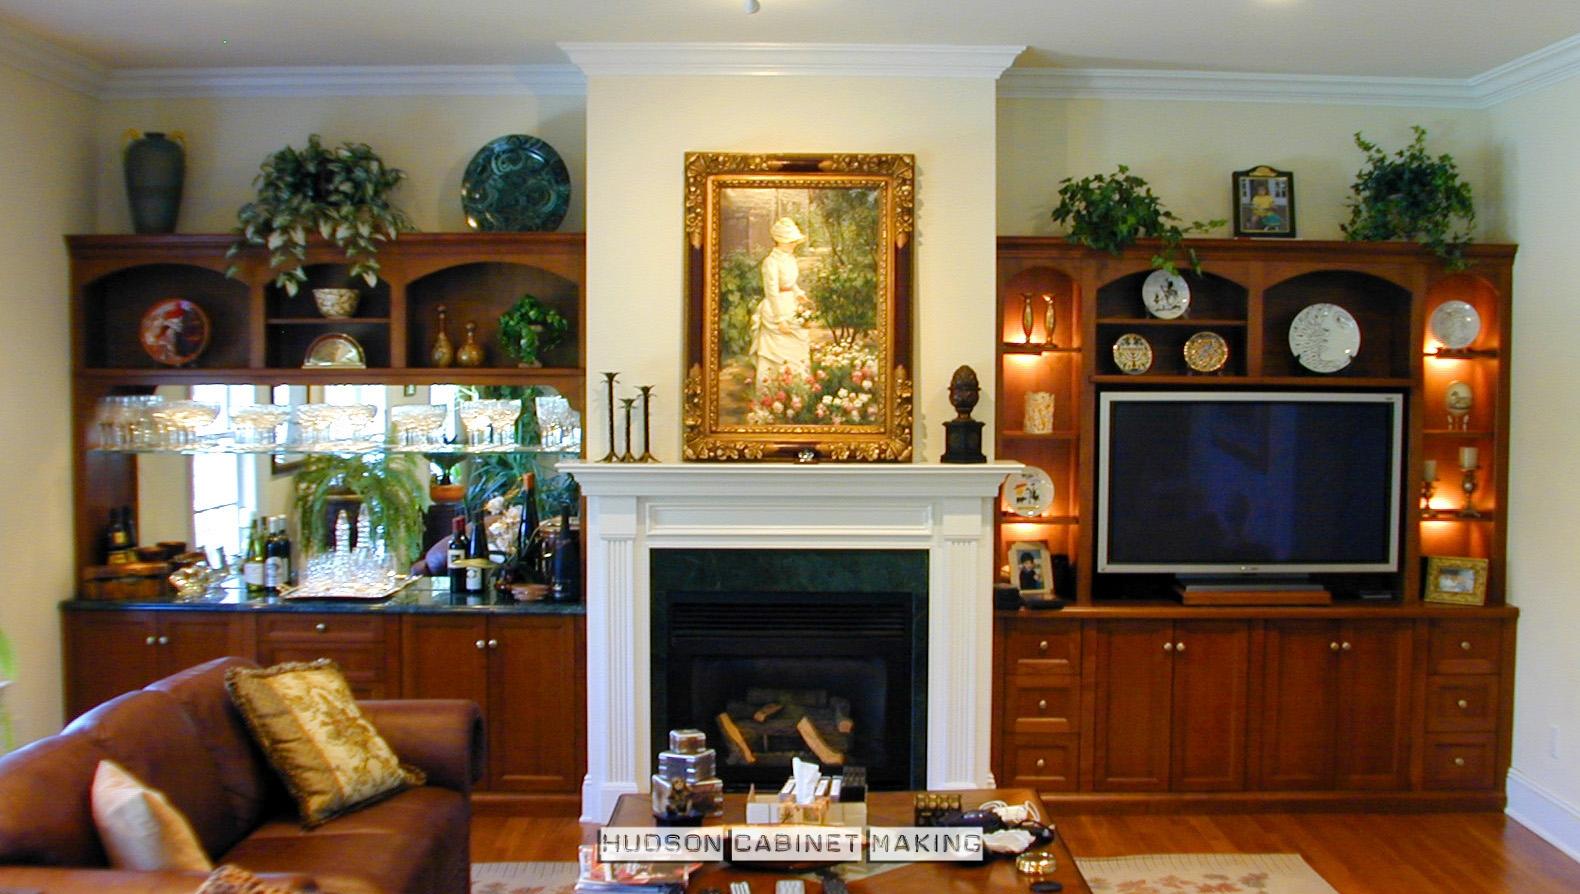 fireplaces hudson cabinet making 845 225 2967